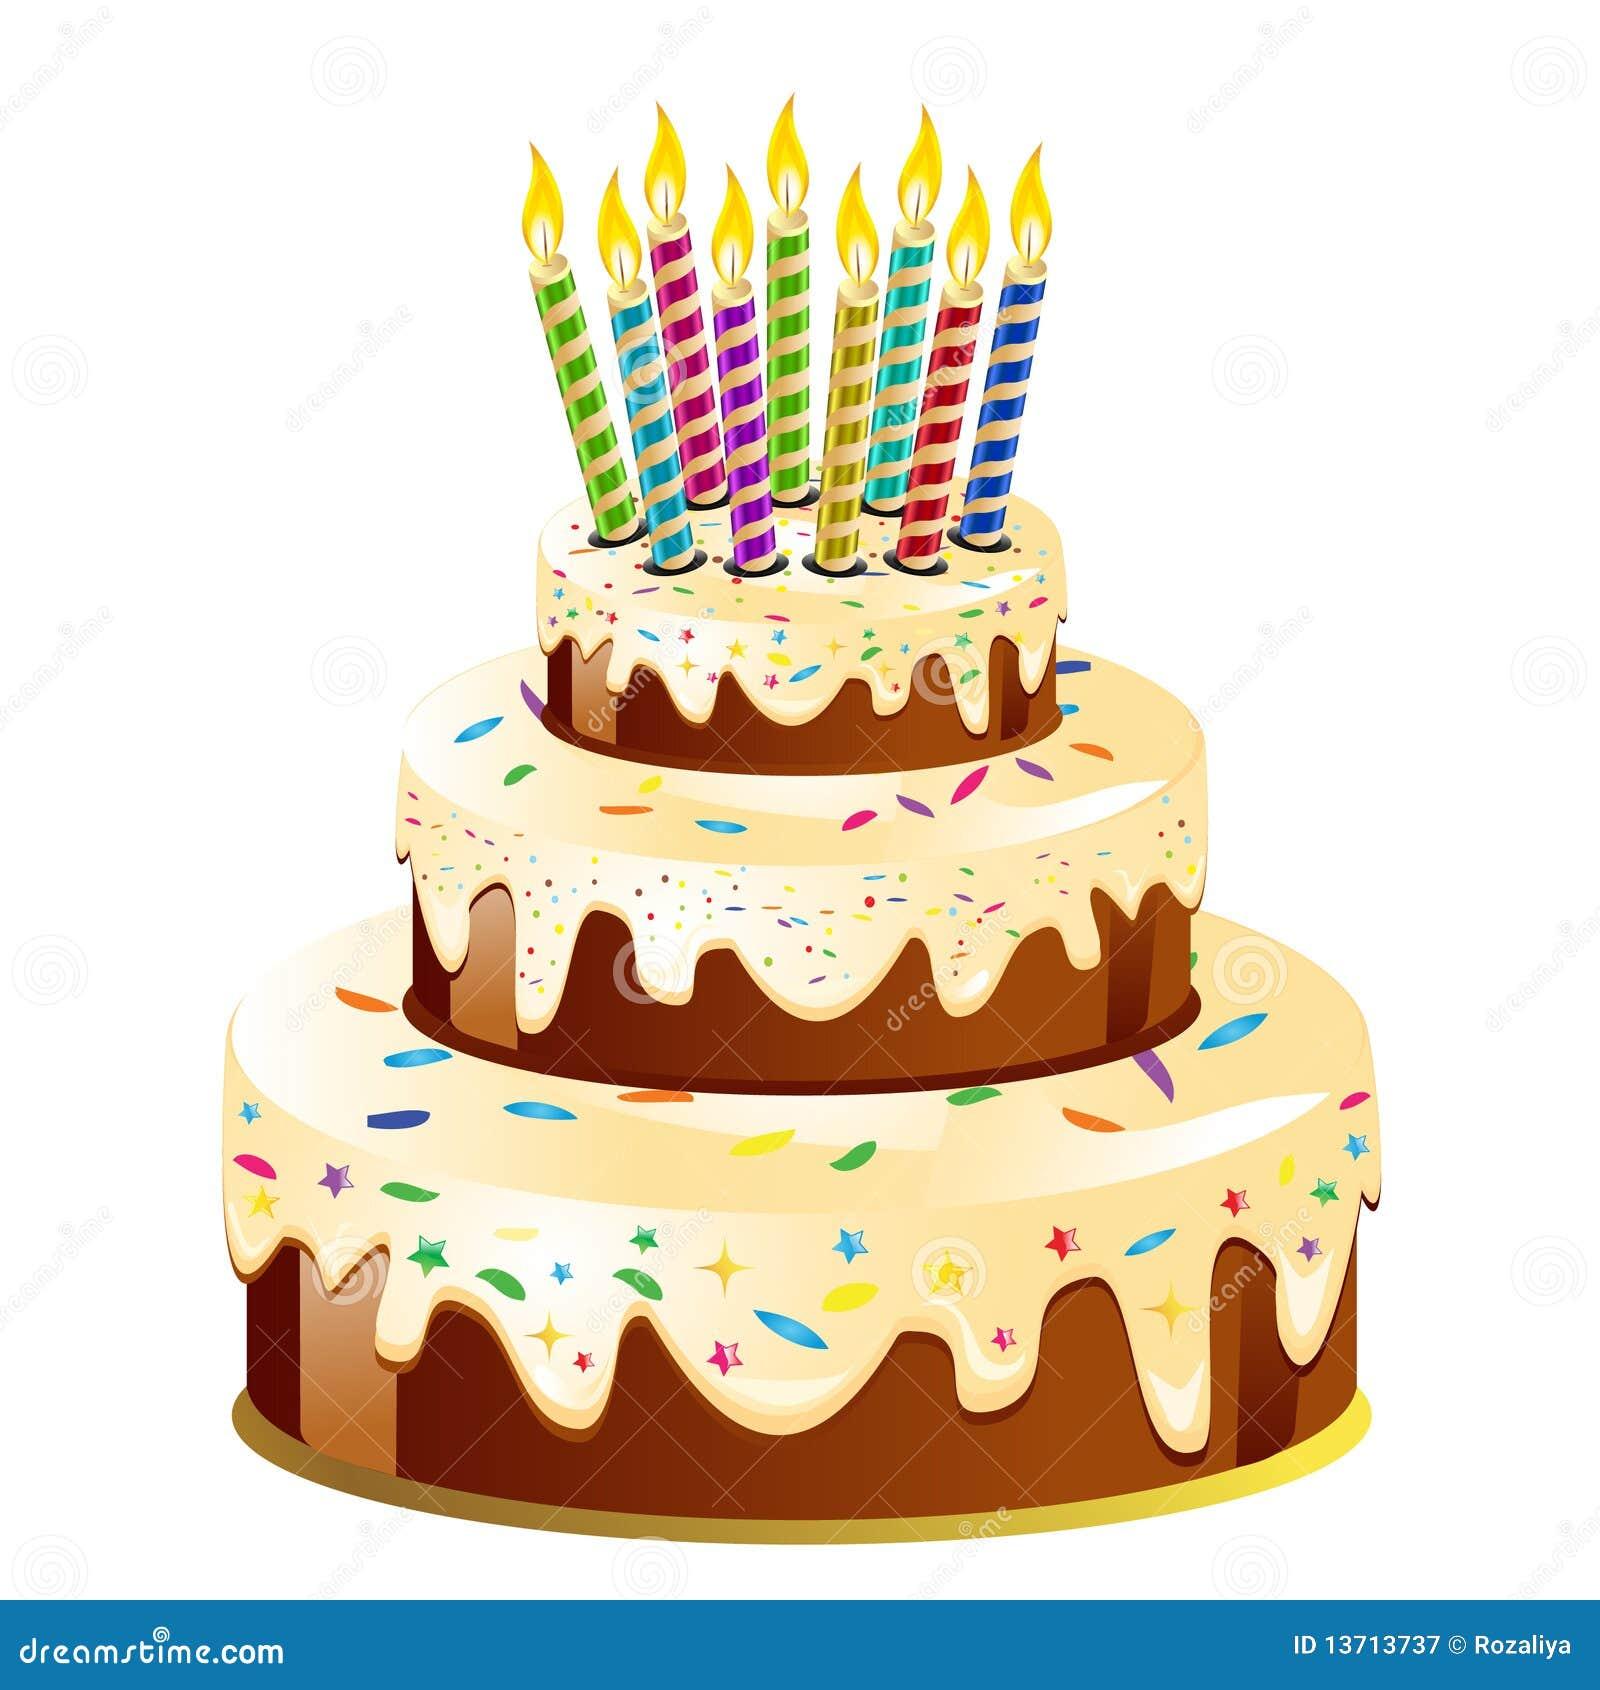 Birthday Cake Sign Language